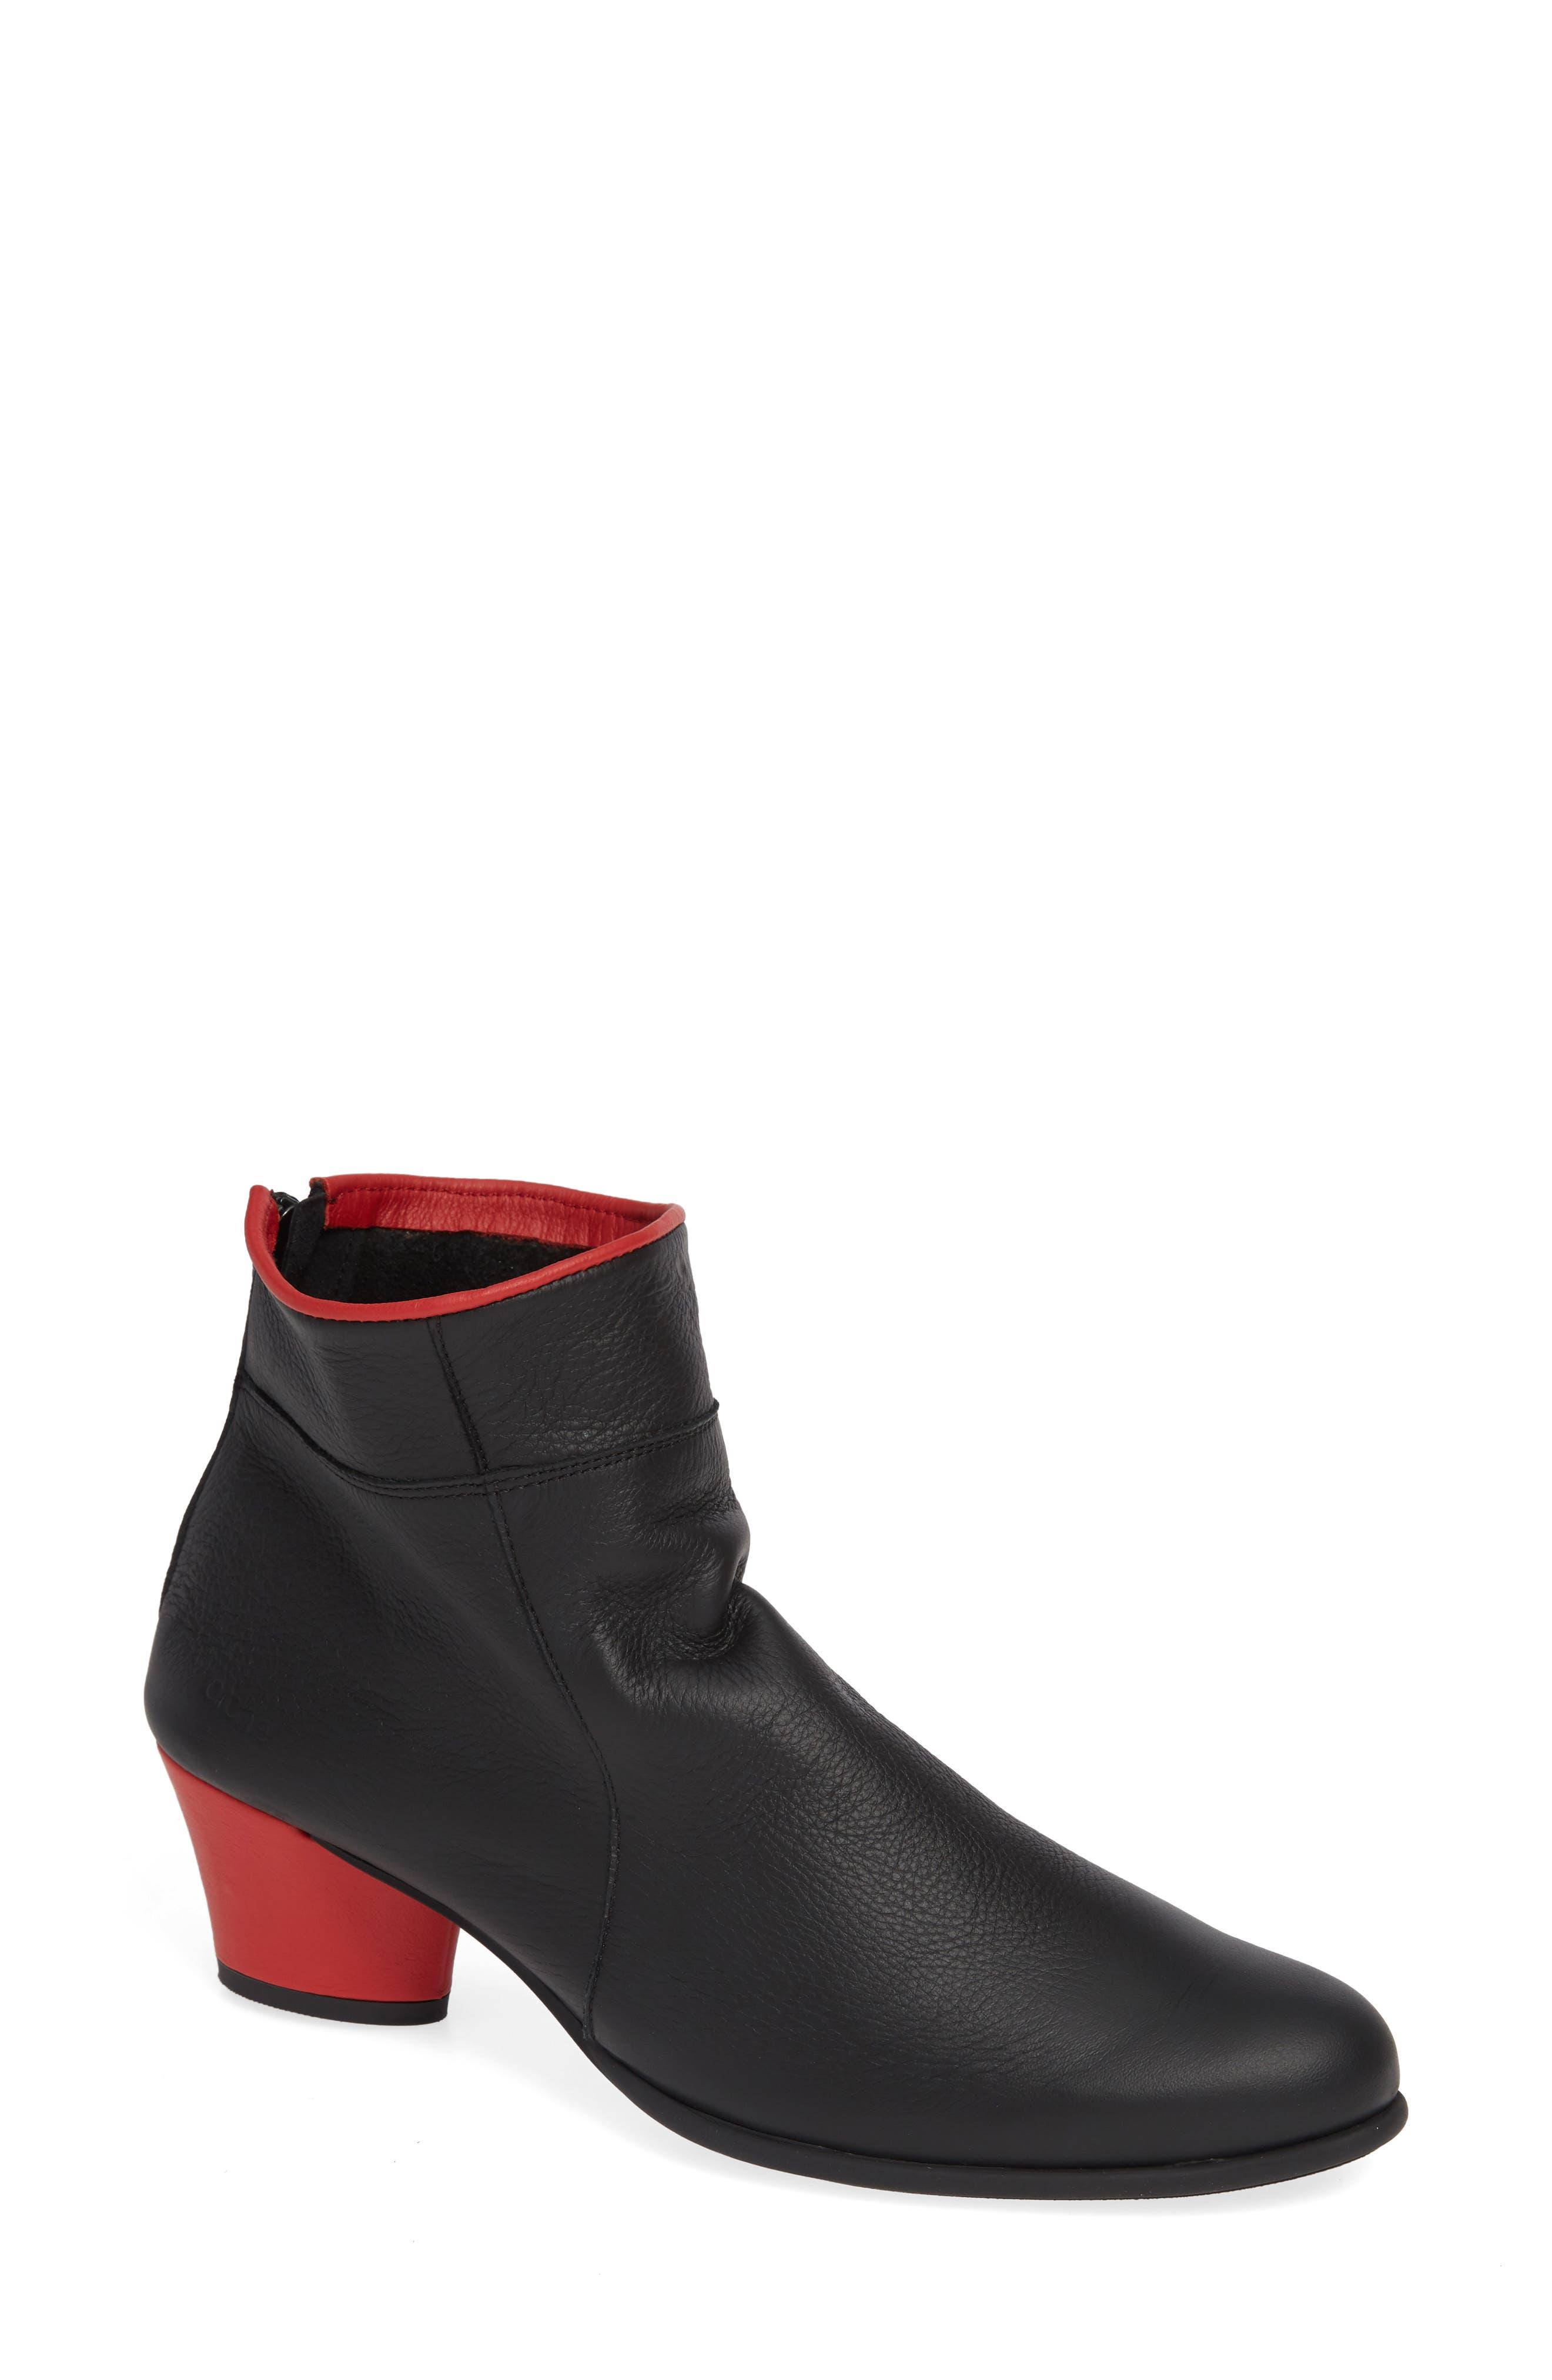 ARCHE Museki Water Resistant Bootie in Noir/ Feu Leather